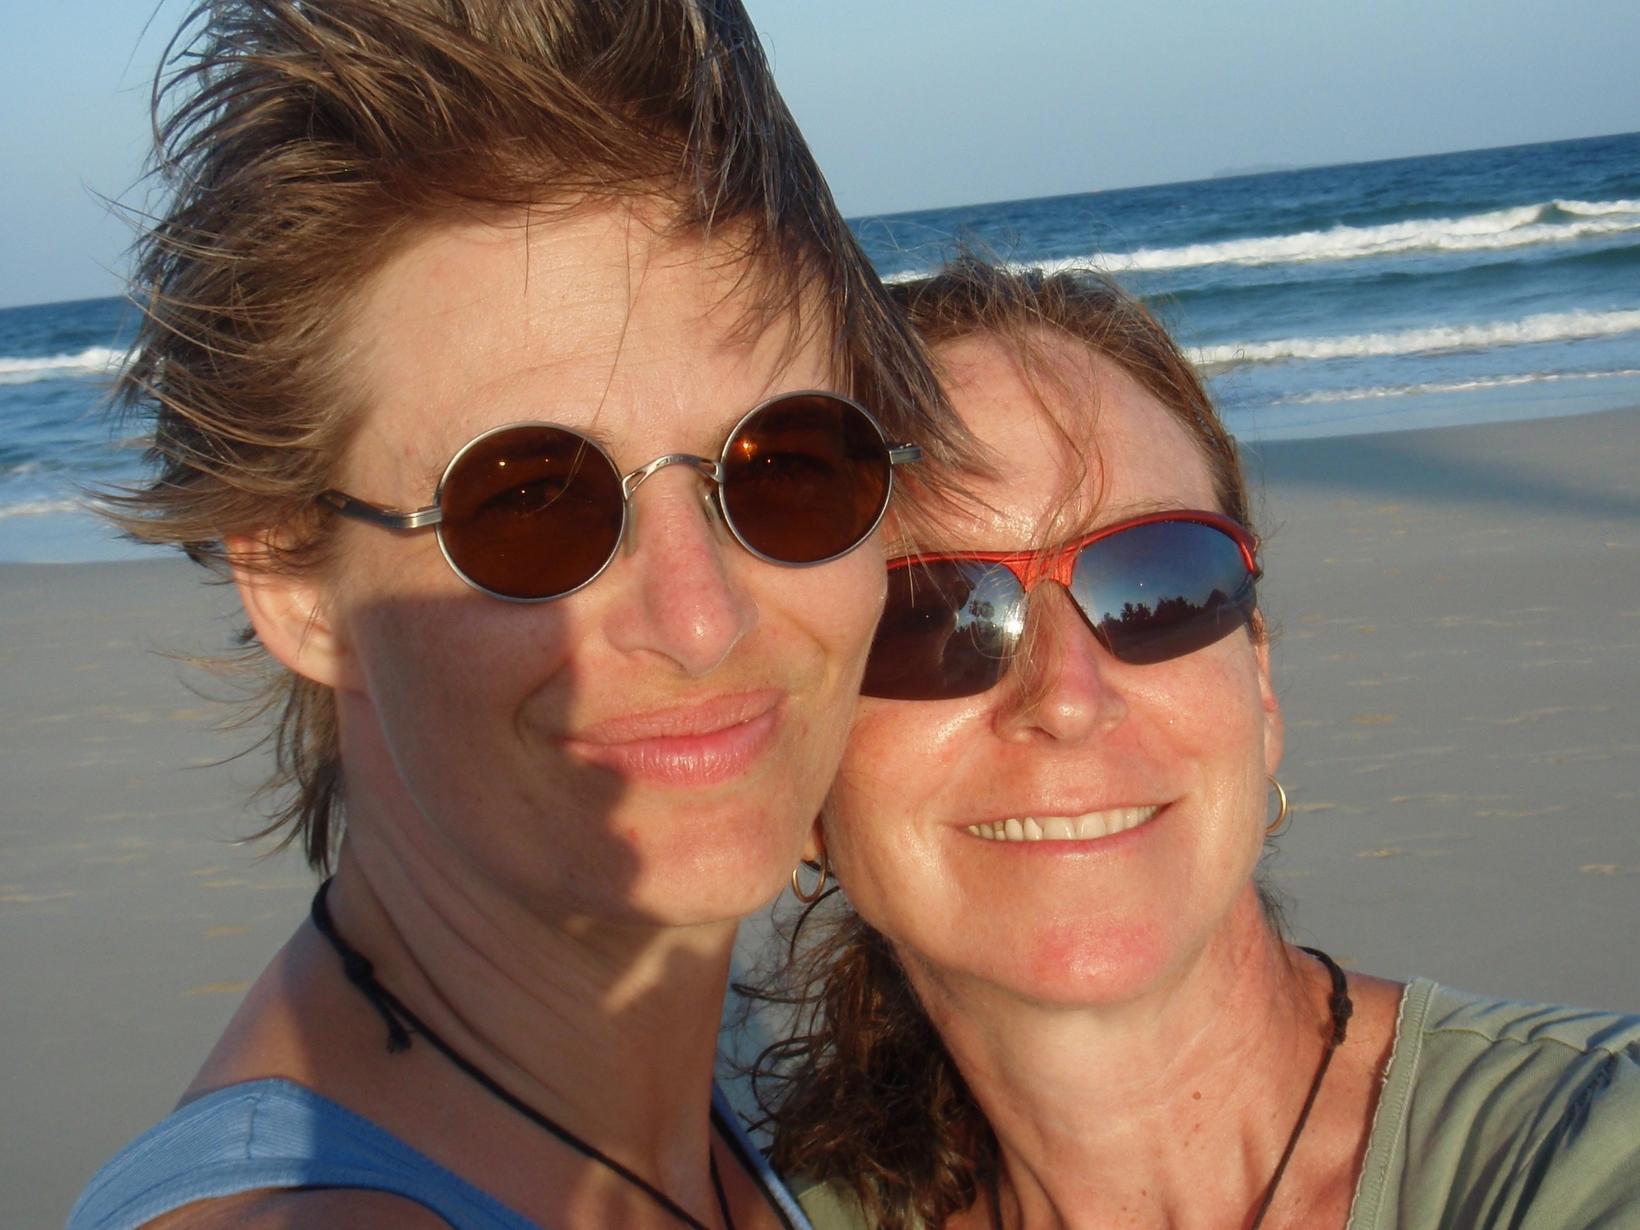 Chantal & Janice from Halifax, Nova Scotia, Canada